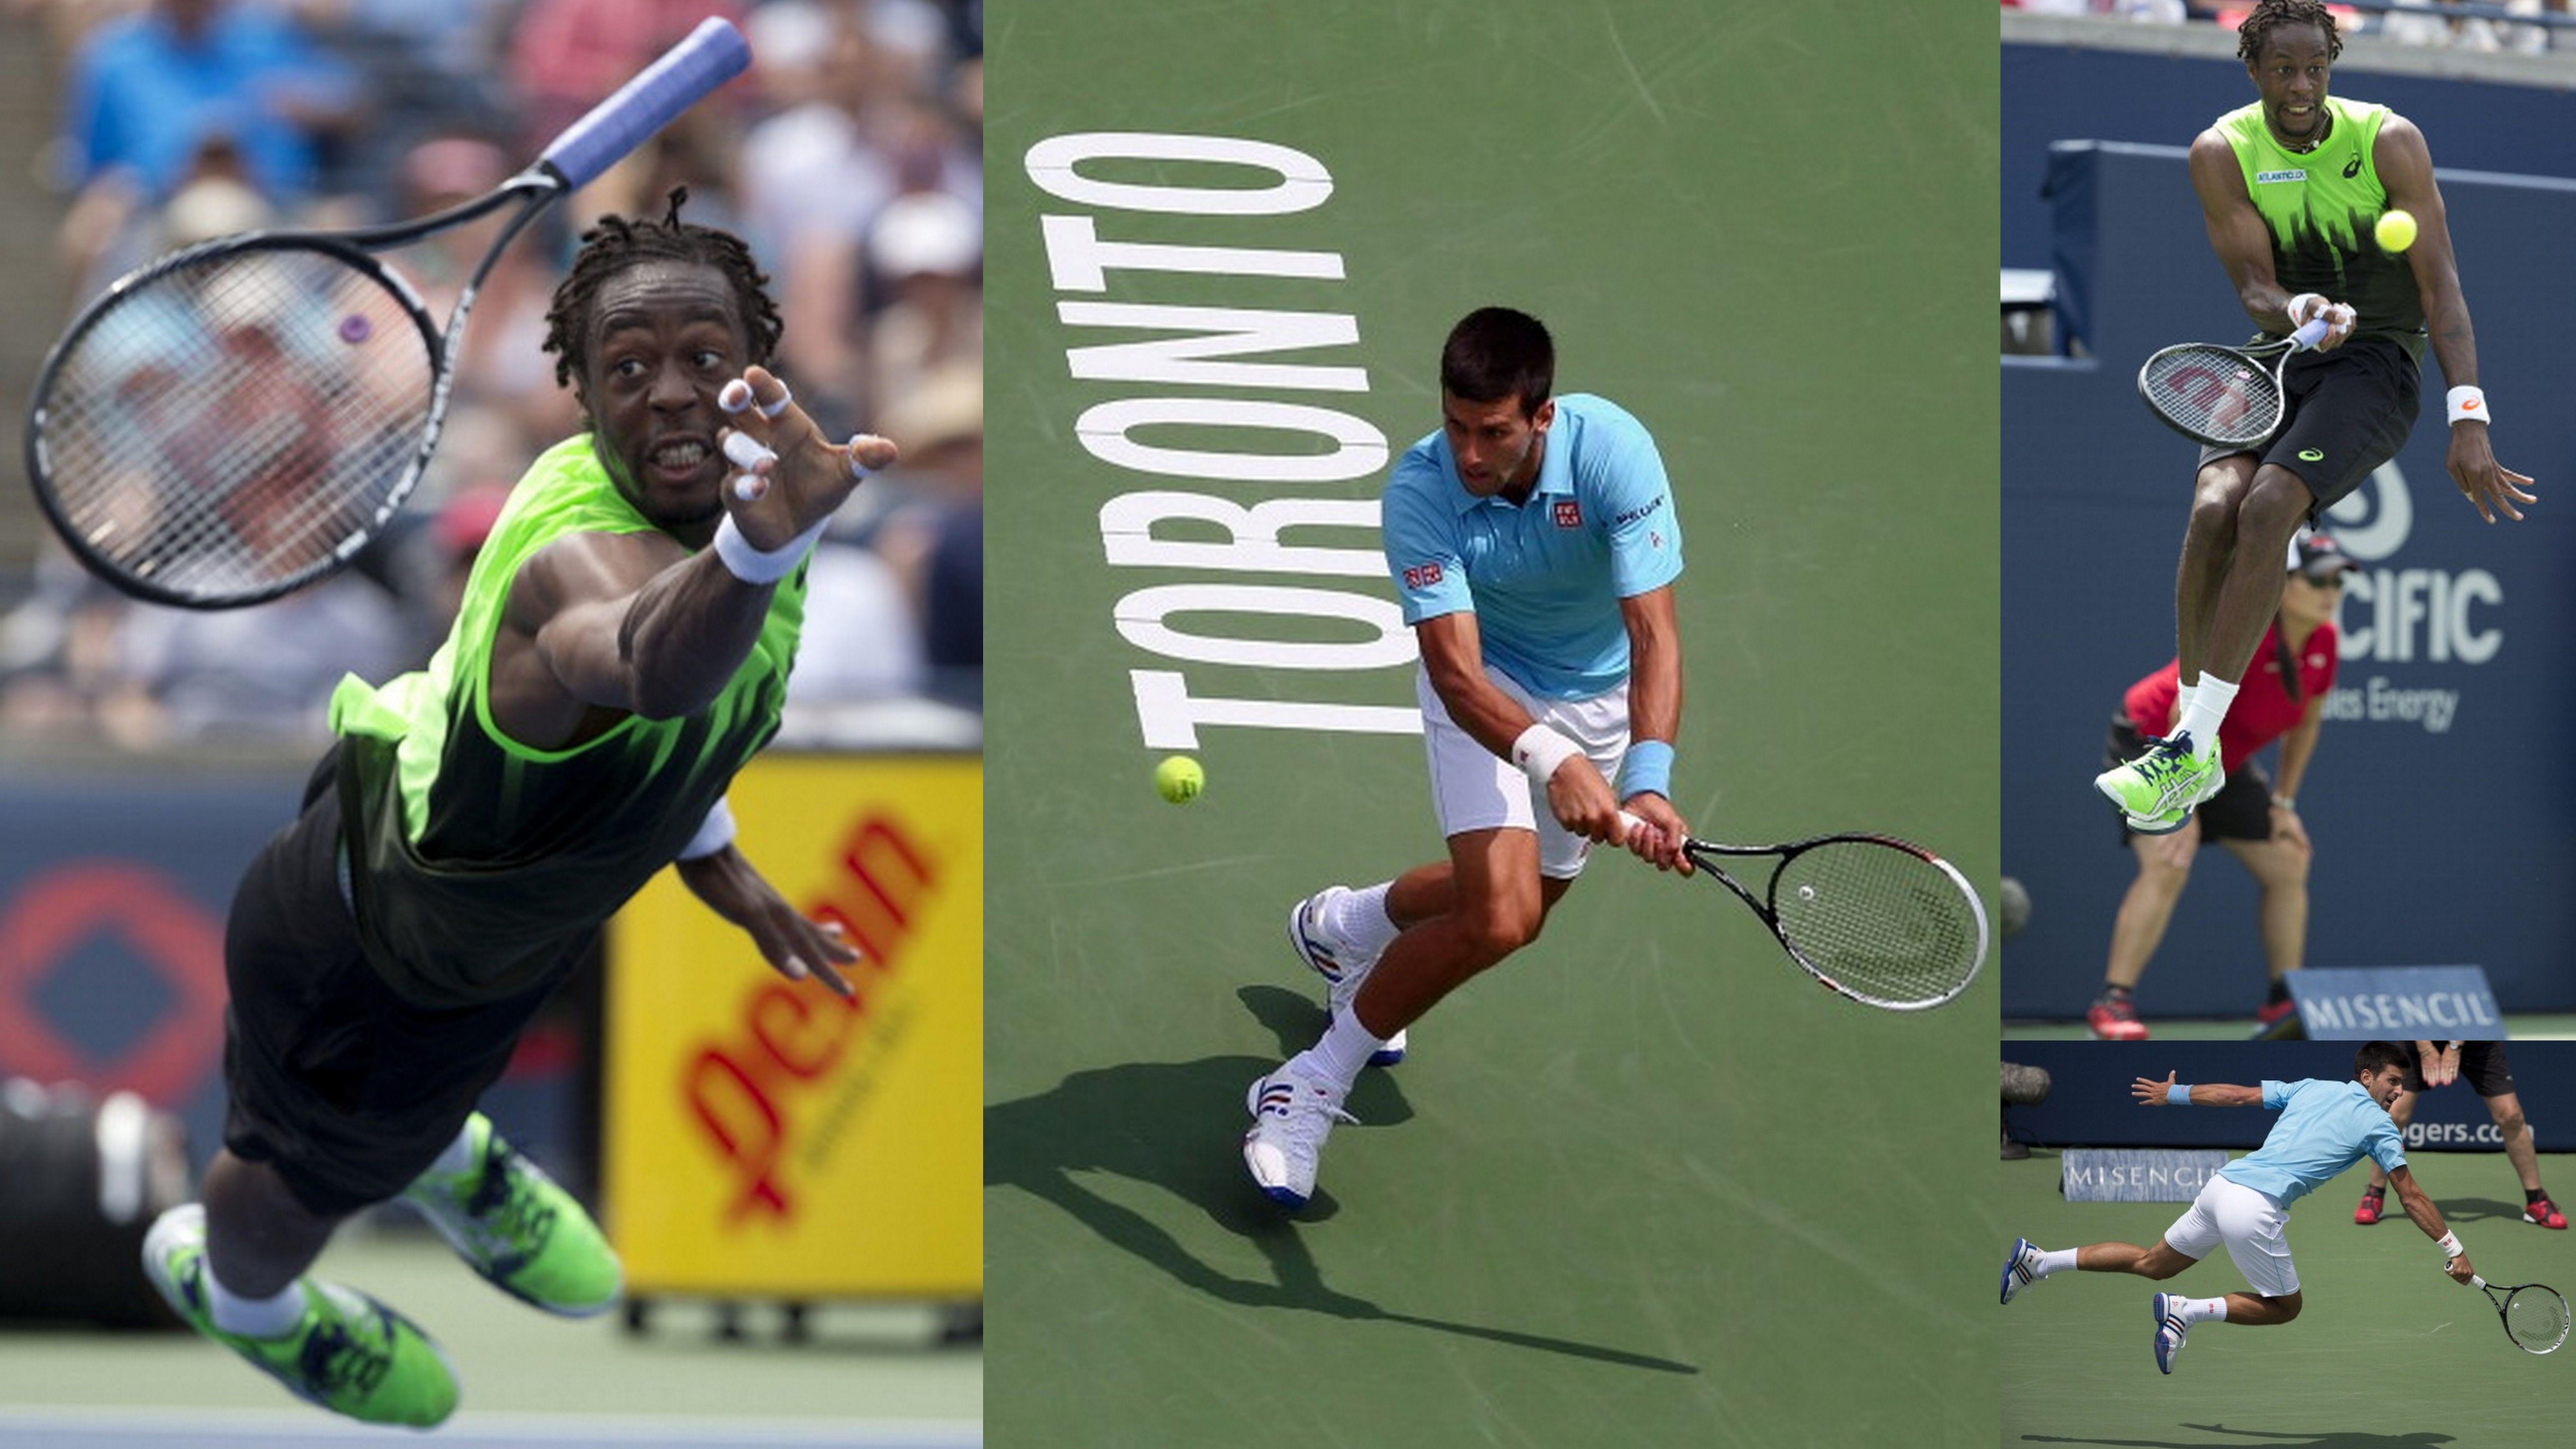 Gael Monfils And Novak Djokovic Jointly Create Tennis Magic In Toronto